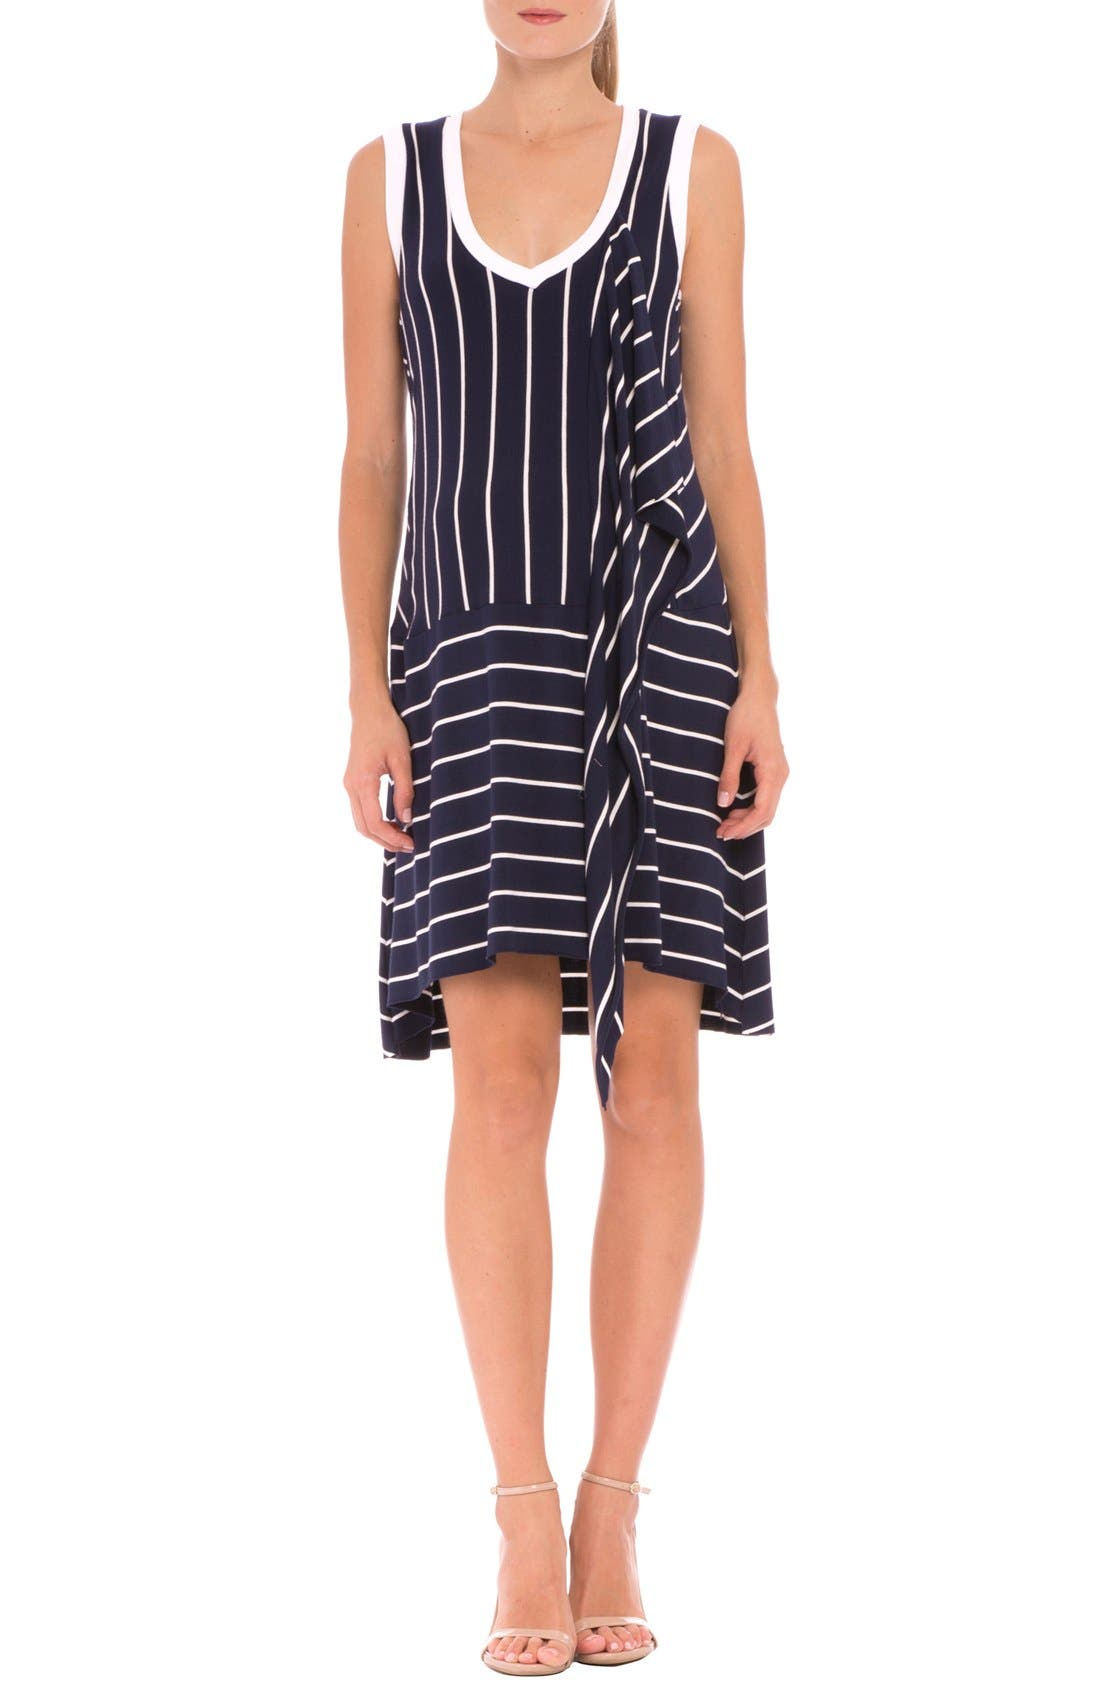 Alternate Image 1 Selected - Olian 'Krystal' Stripe Ruffle Maternity Dress